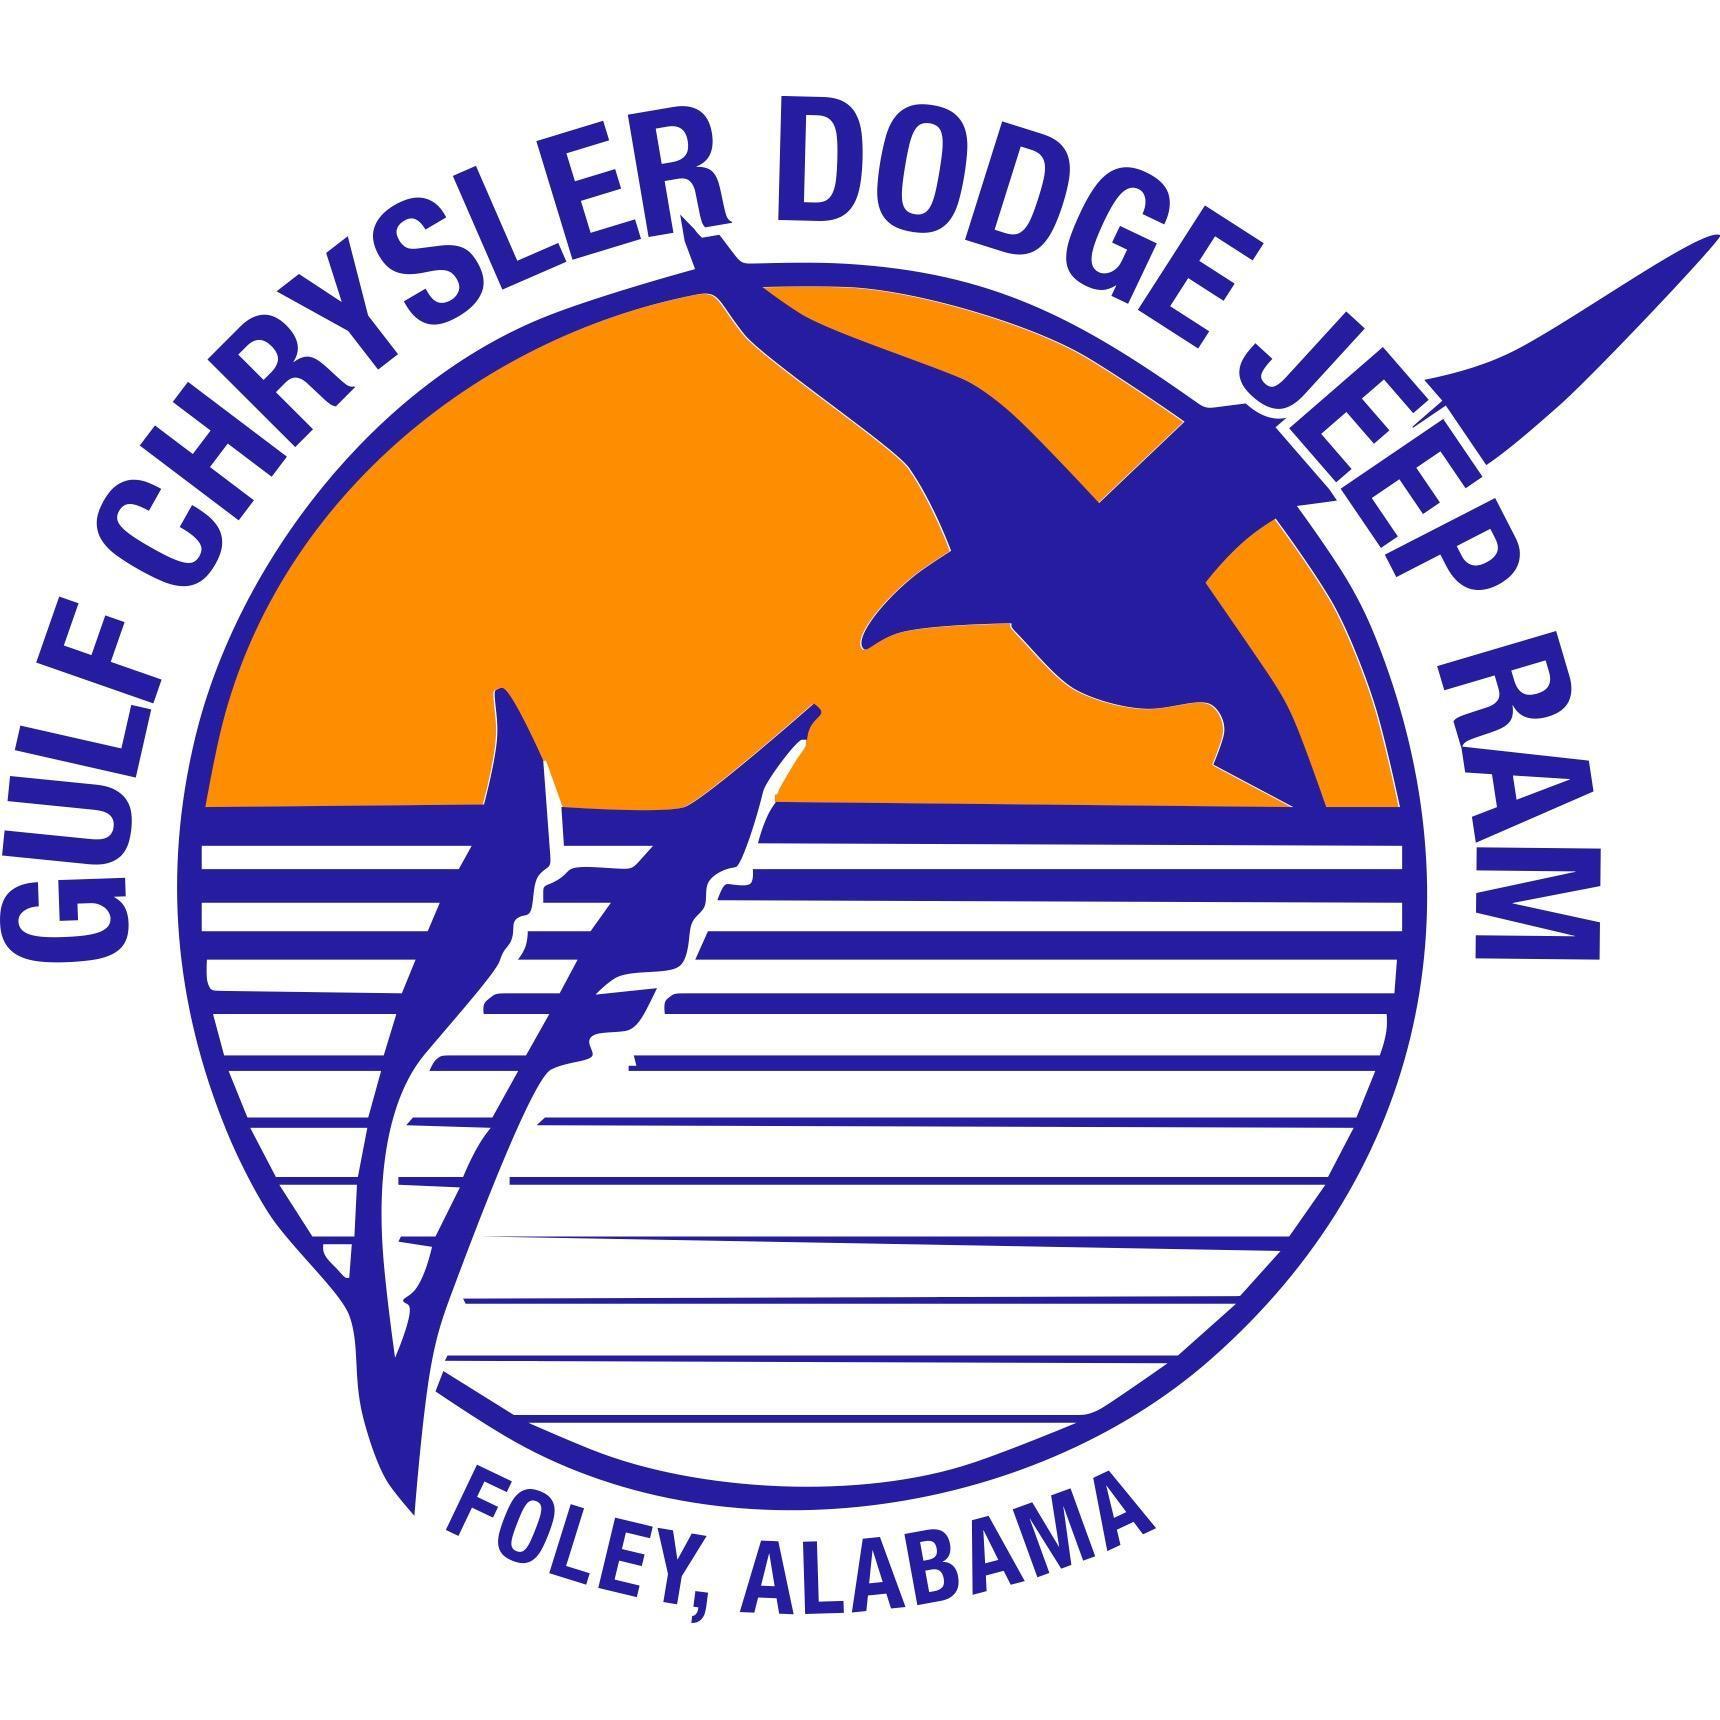 Gulf Chrysler Dodge Jeep